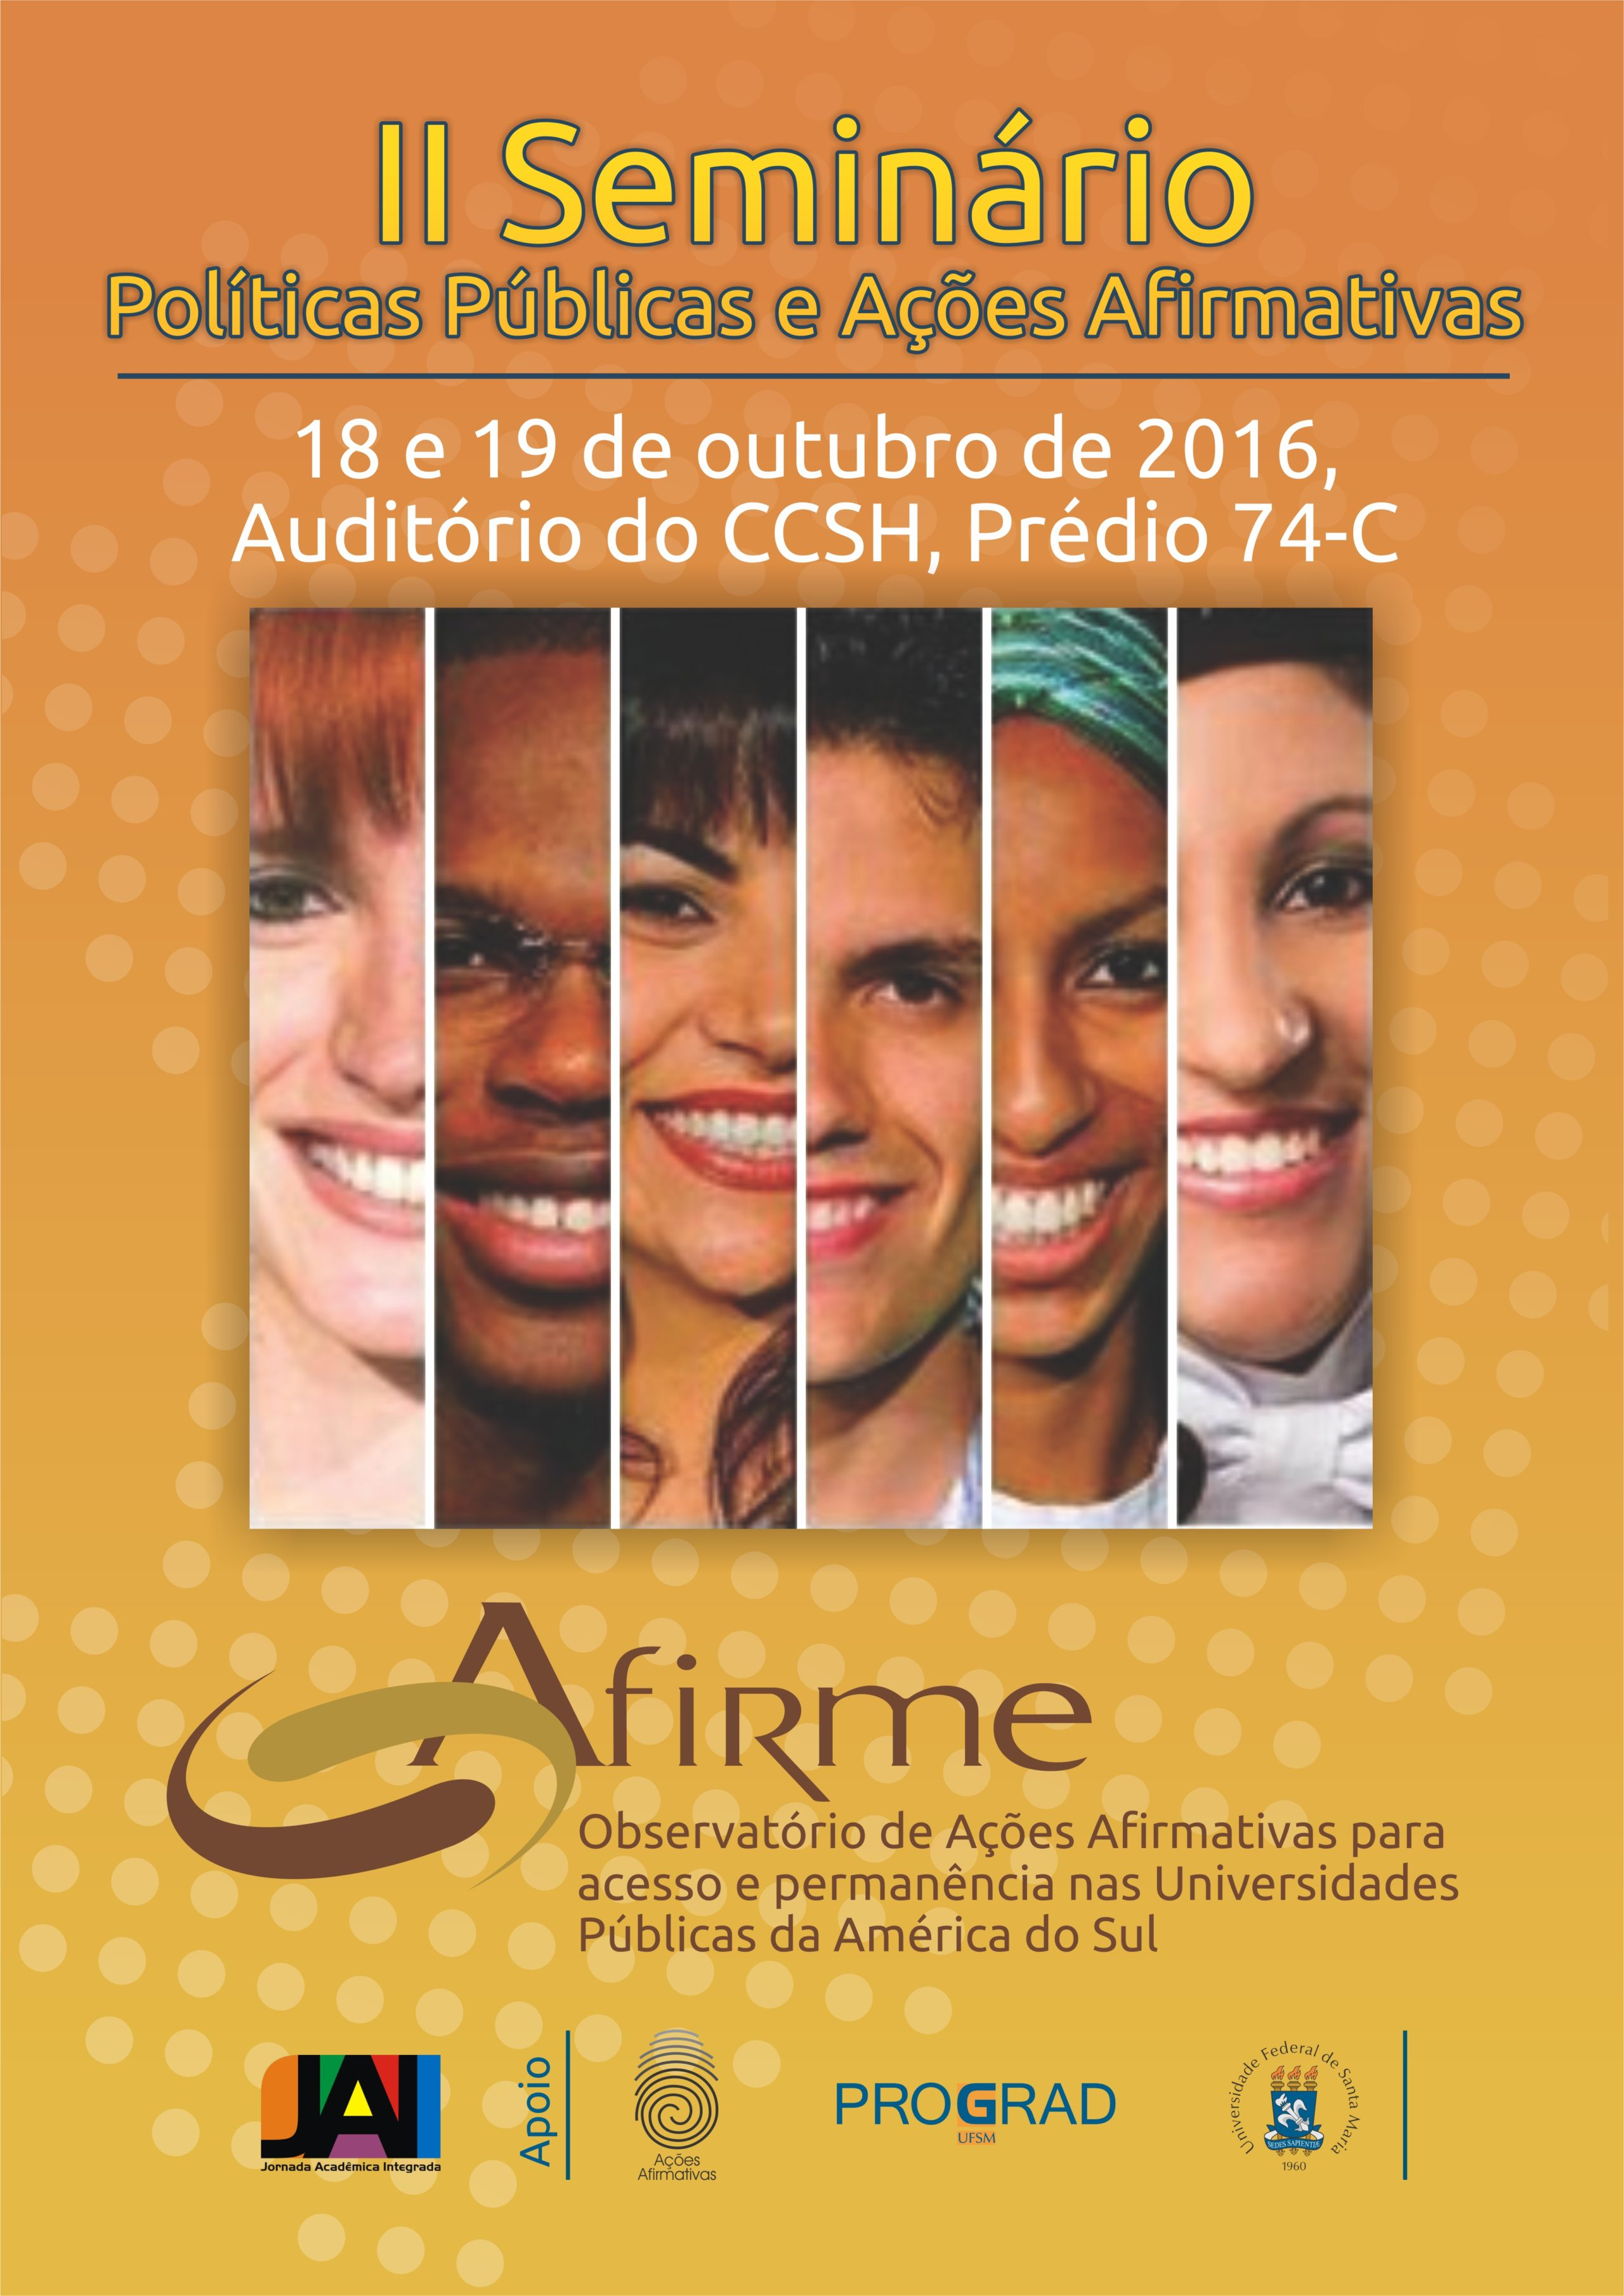 Cartaz Afirme 2016 02